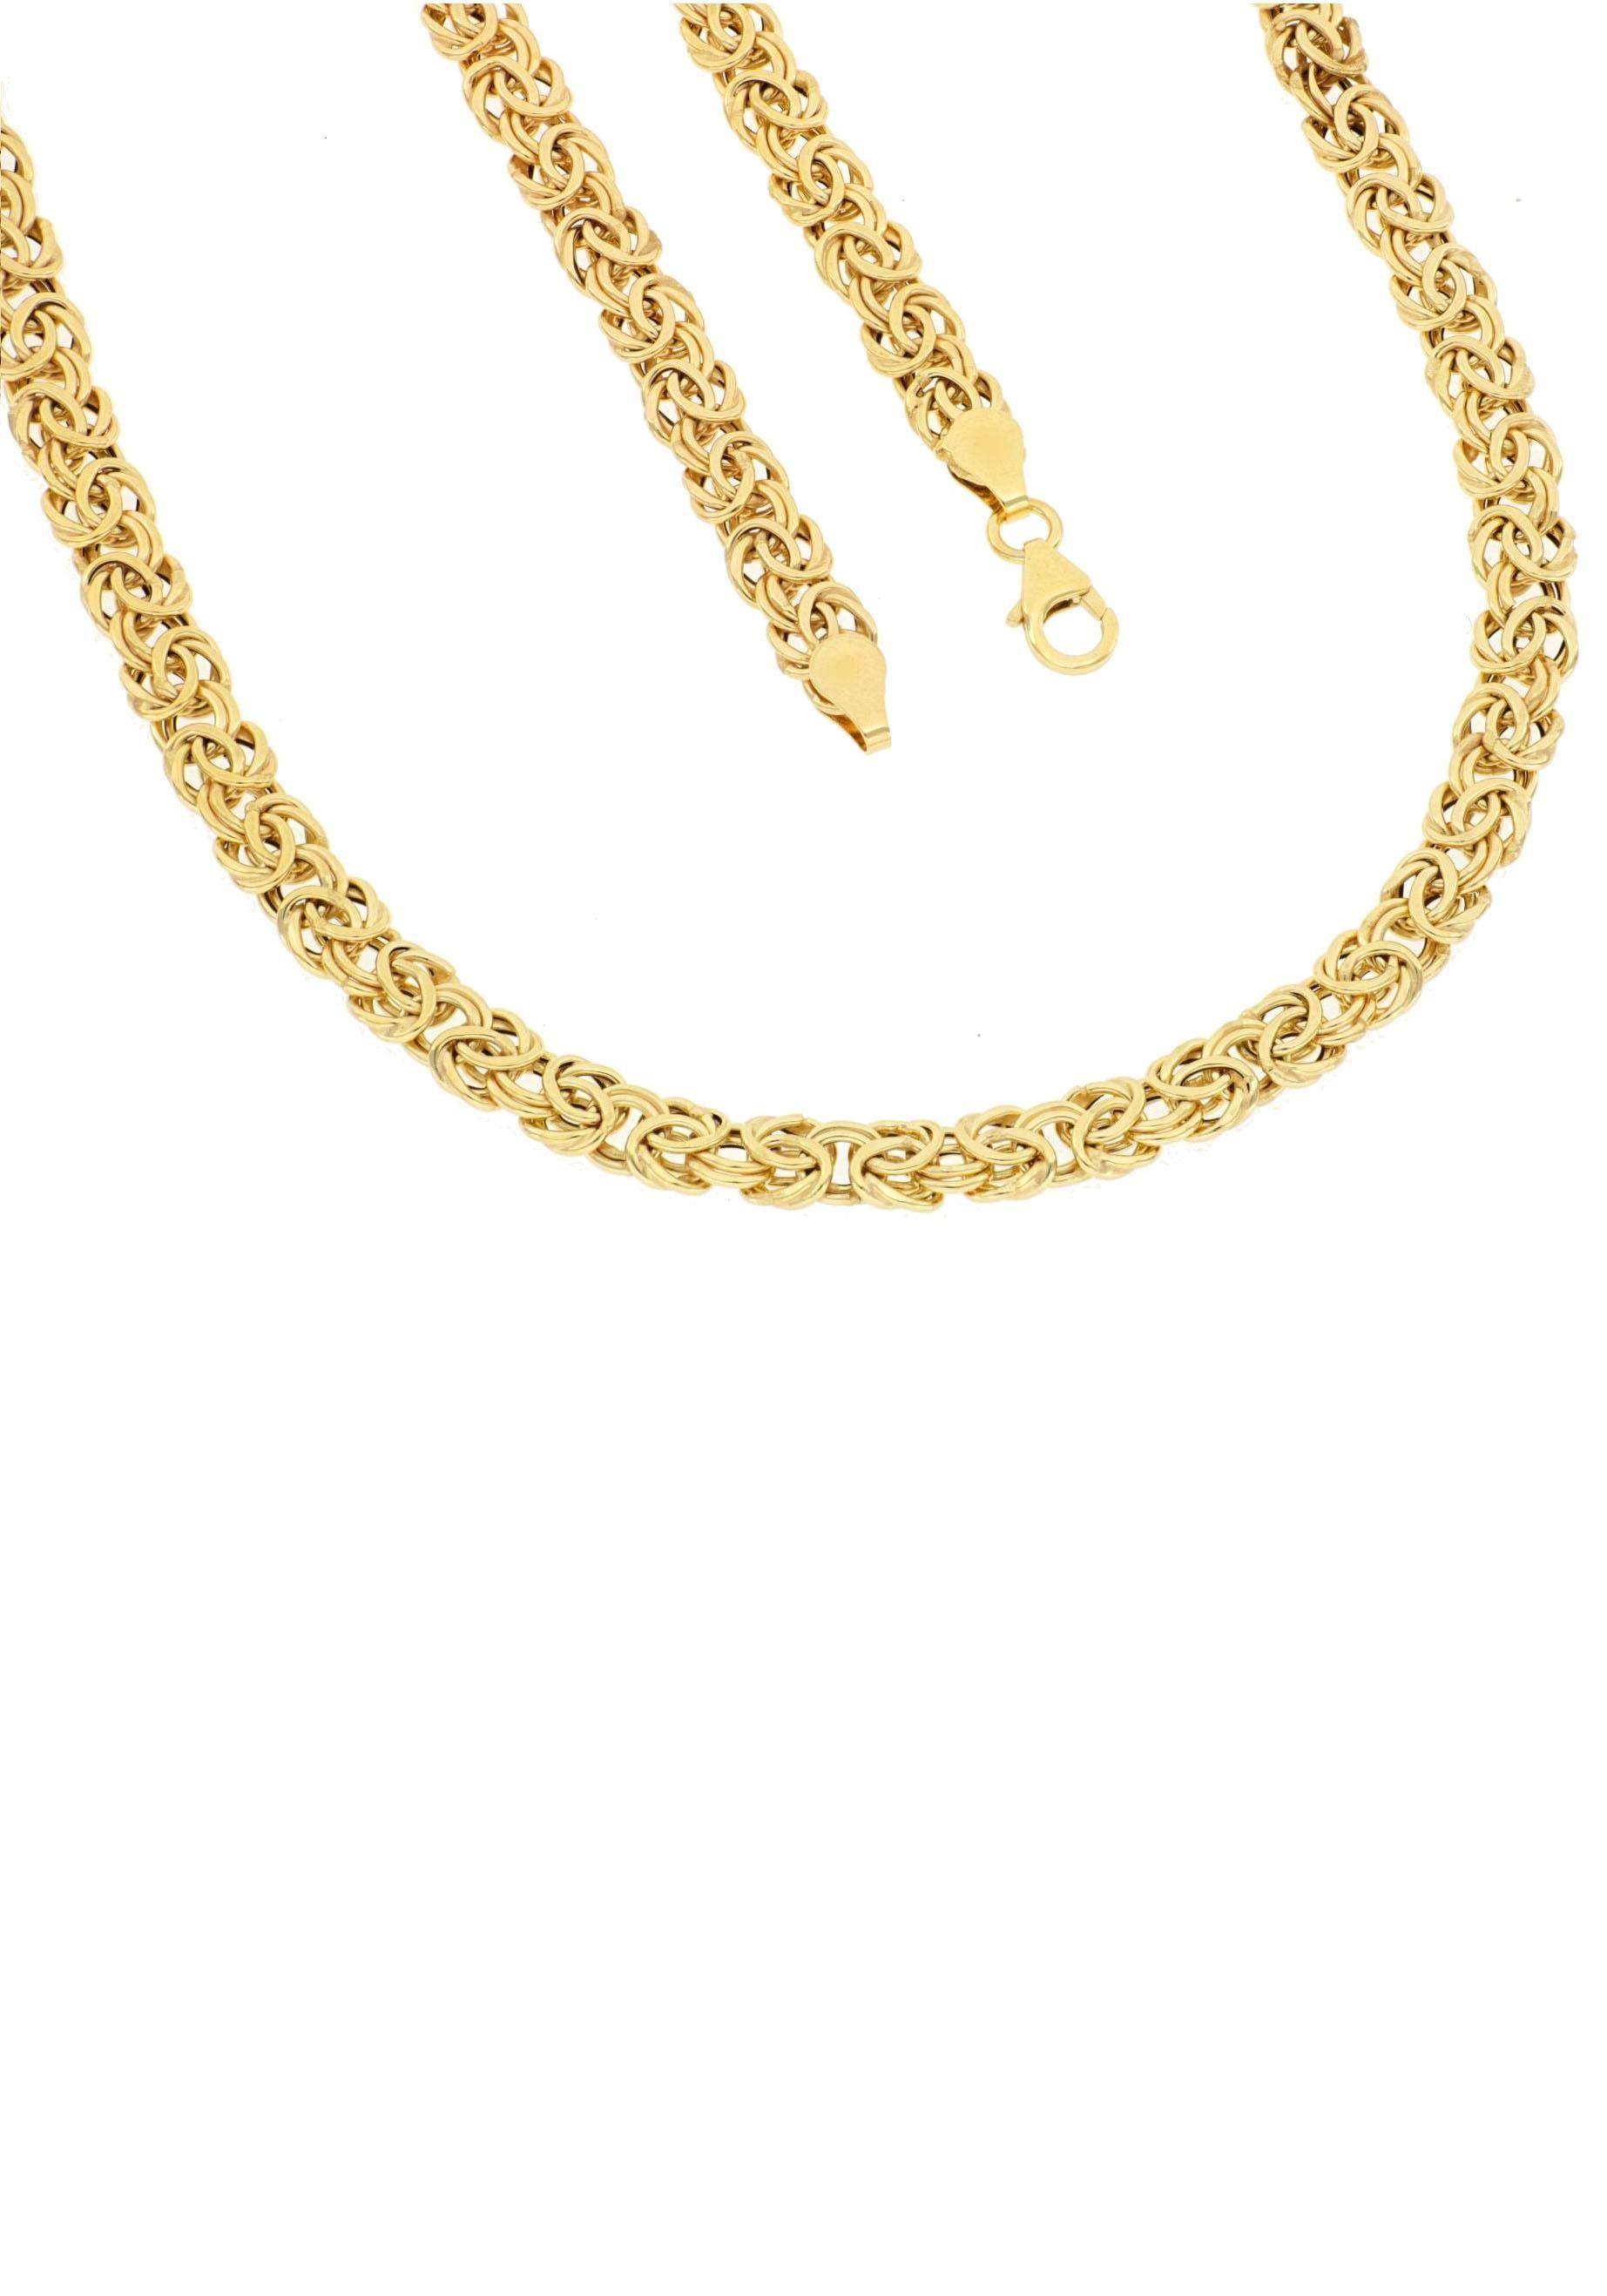 Firetti Goldkette Glanz, oval, Königskettengliederung